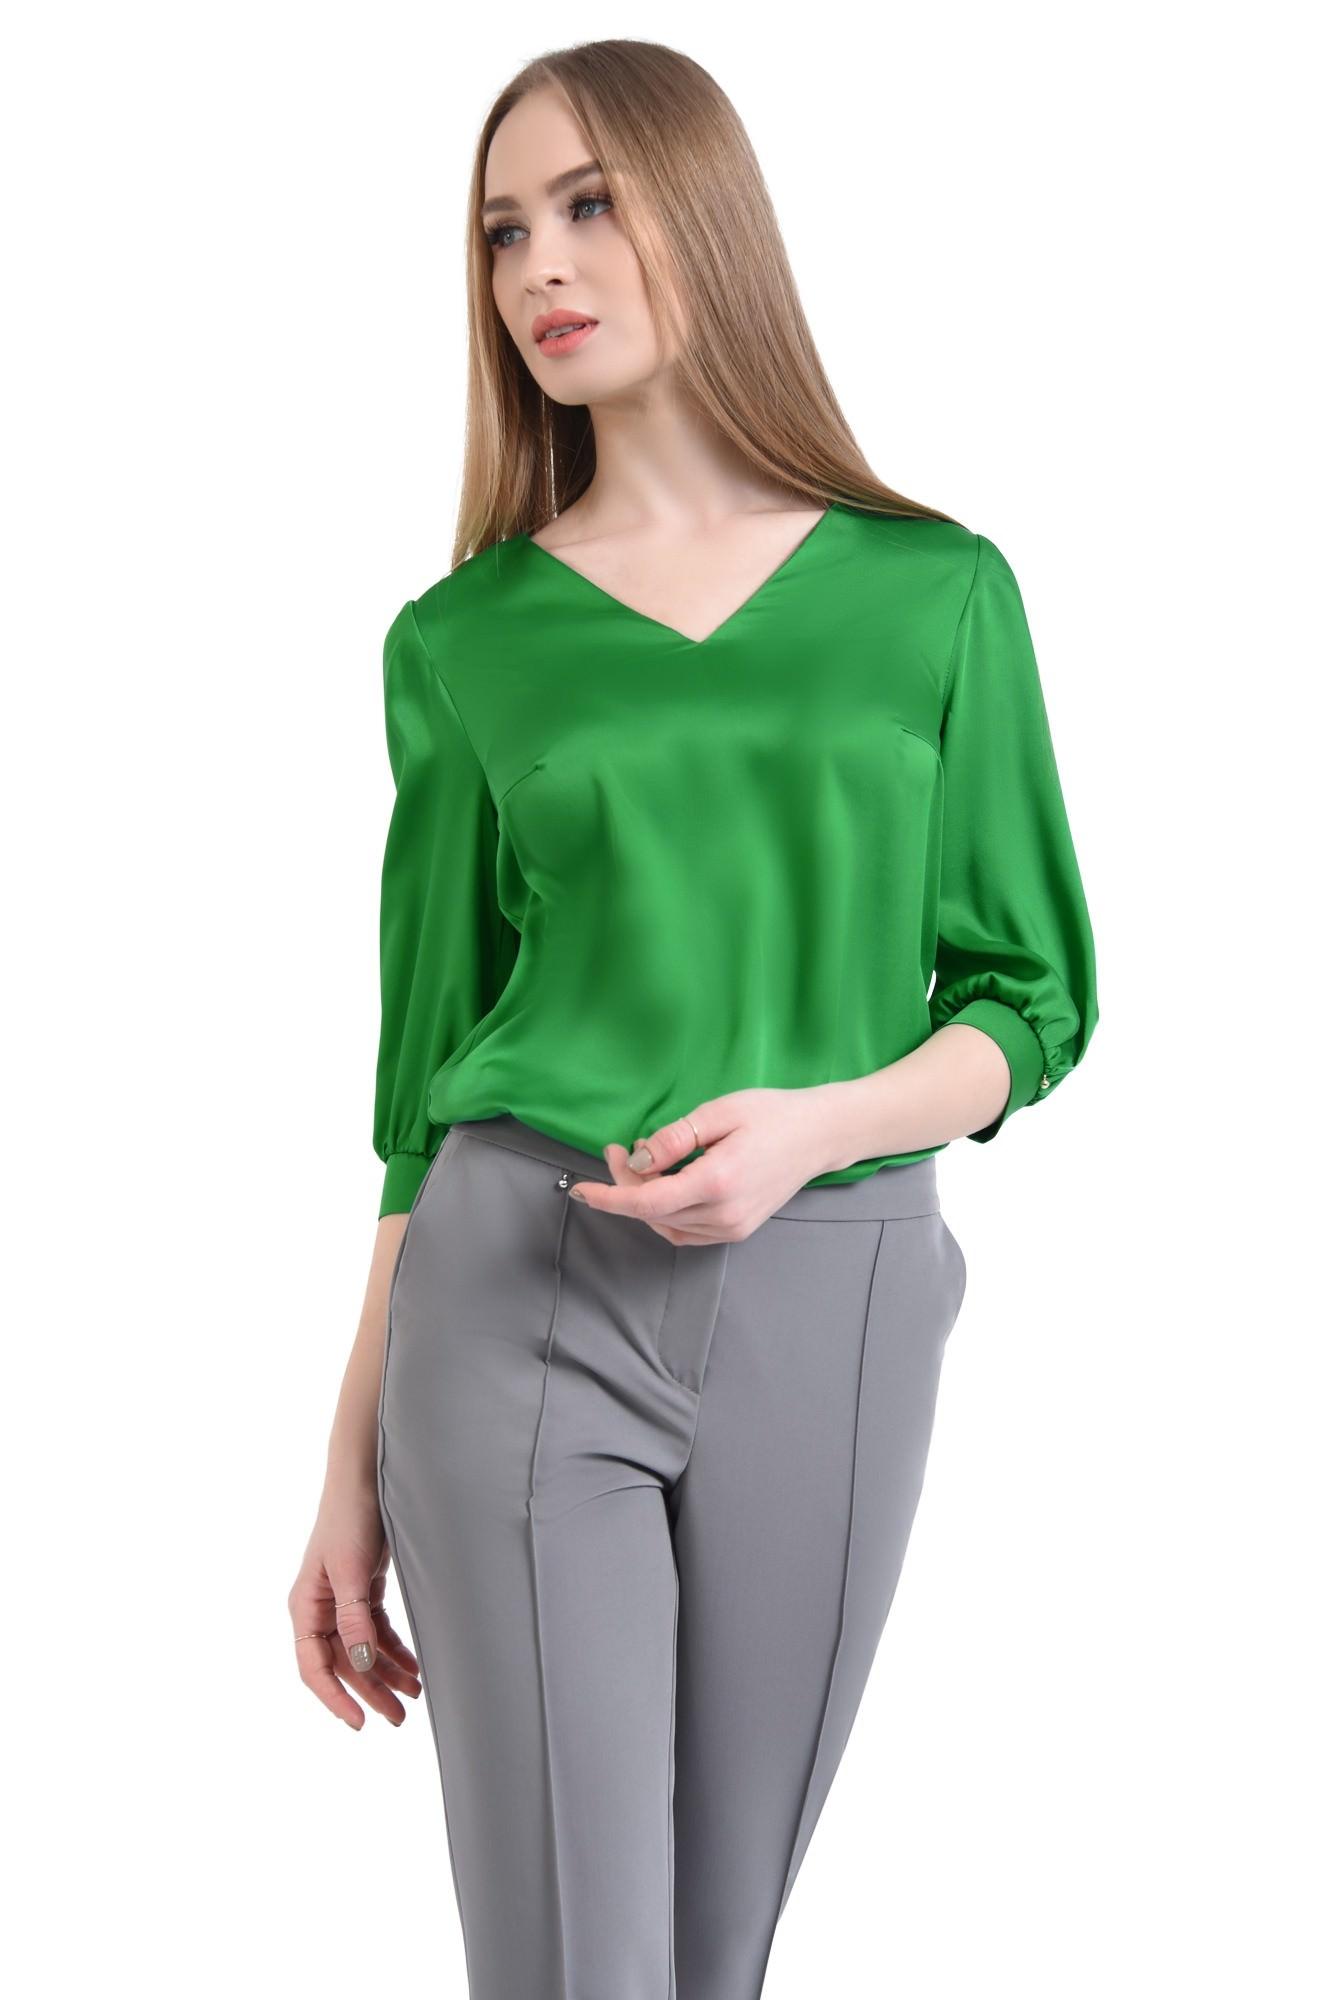 0 - Bluza eleganta, verde, satin